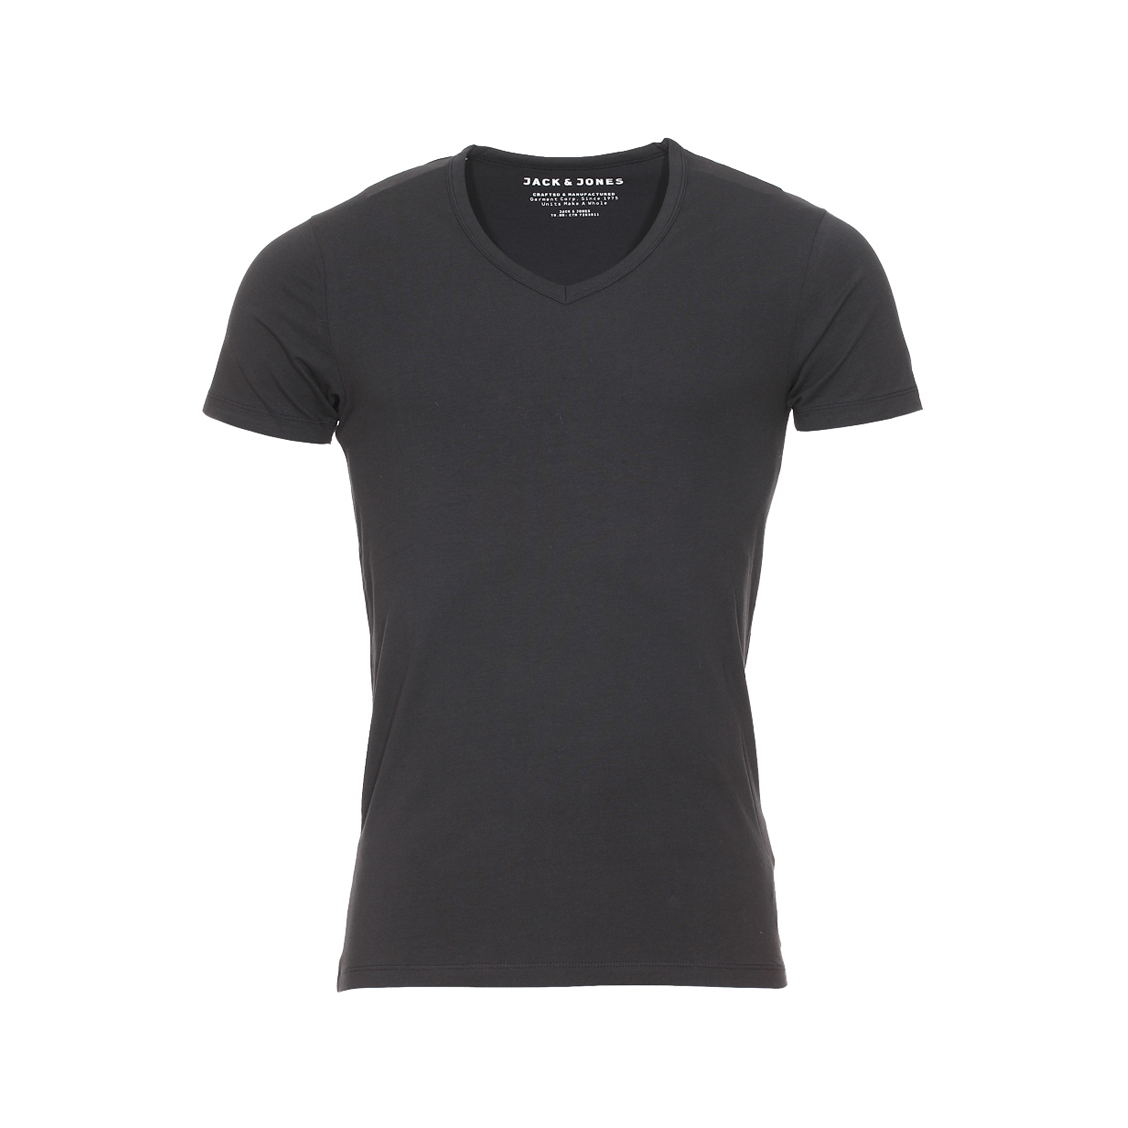 Tee-shirt col v jack&jones en coton stretch noir